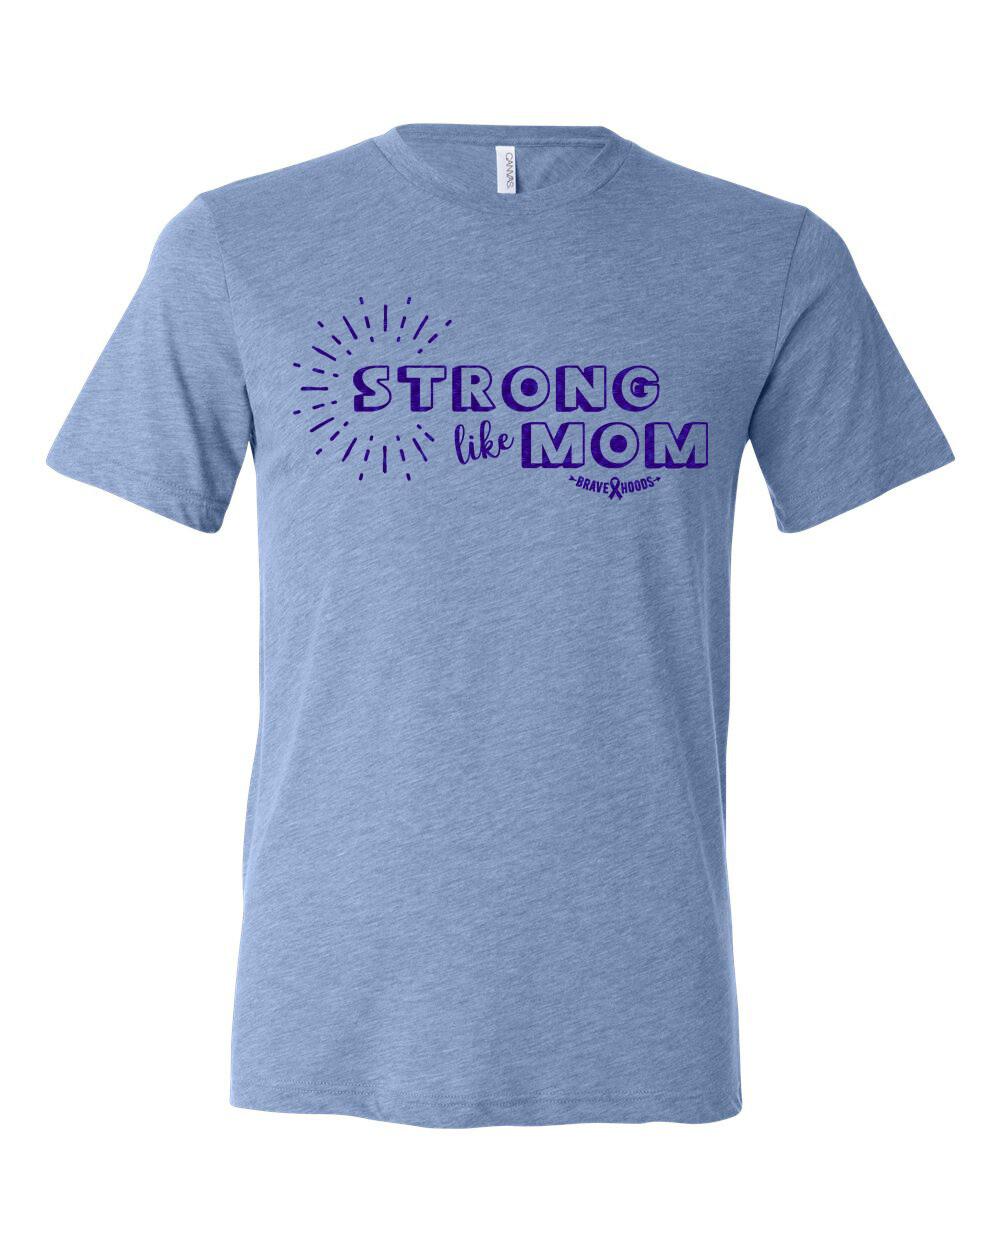 Strong Like Mom - Kids T shirt